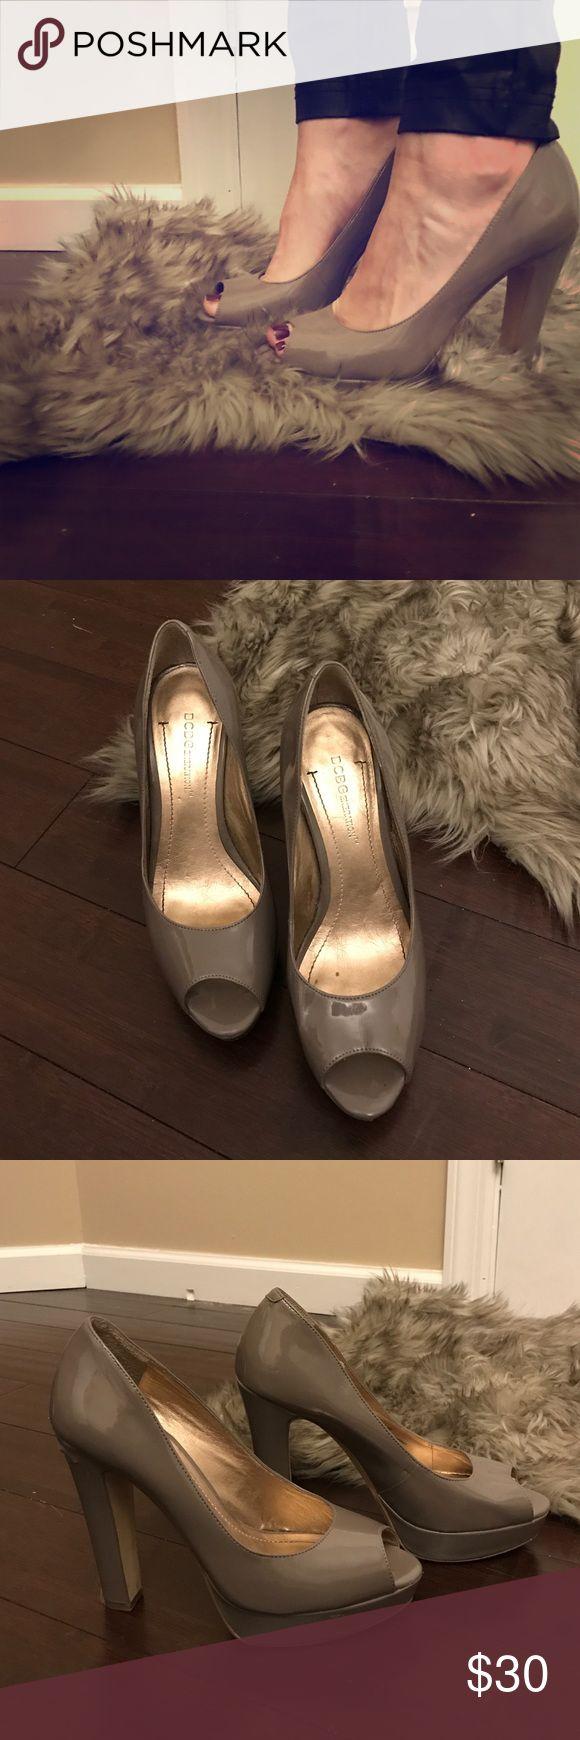 BCBGeneration peep toe pumps Grey pumps 👠 BCBGeneration Shoes Heels